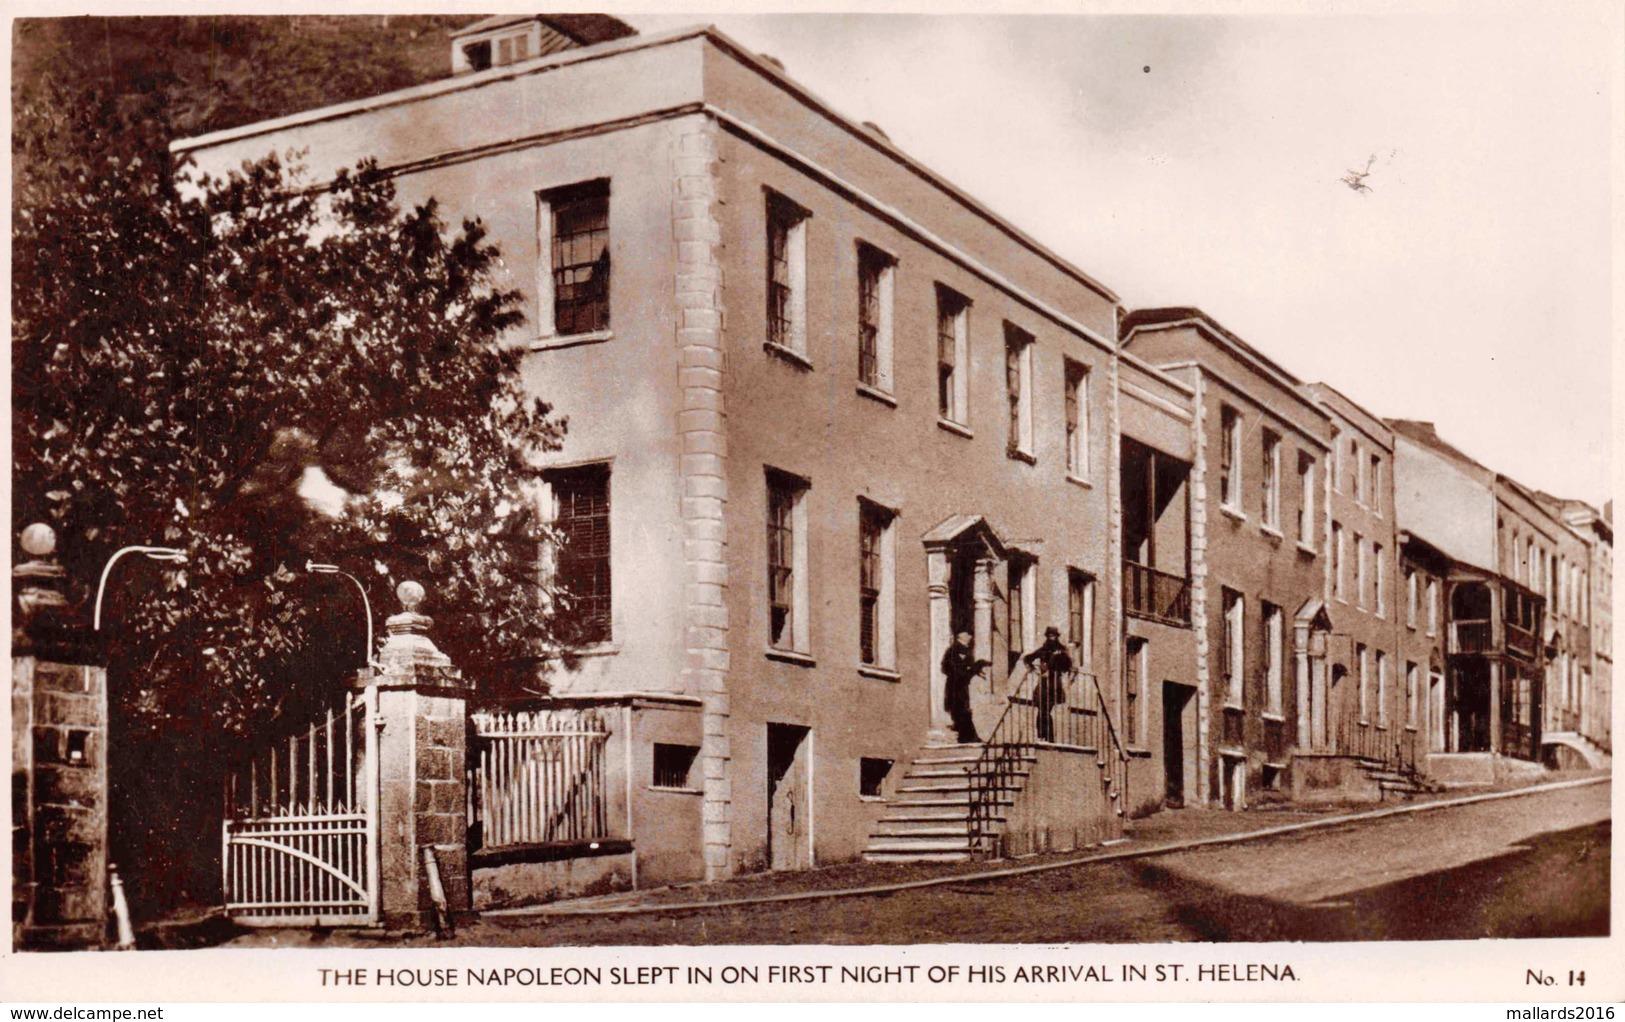 ST. HELENA - THE HOUSE NAPOLEON SLEPT ON HIS 1st NIGHT ~ PHOTO POSTCARD #92809 - St. Helena